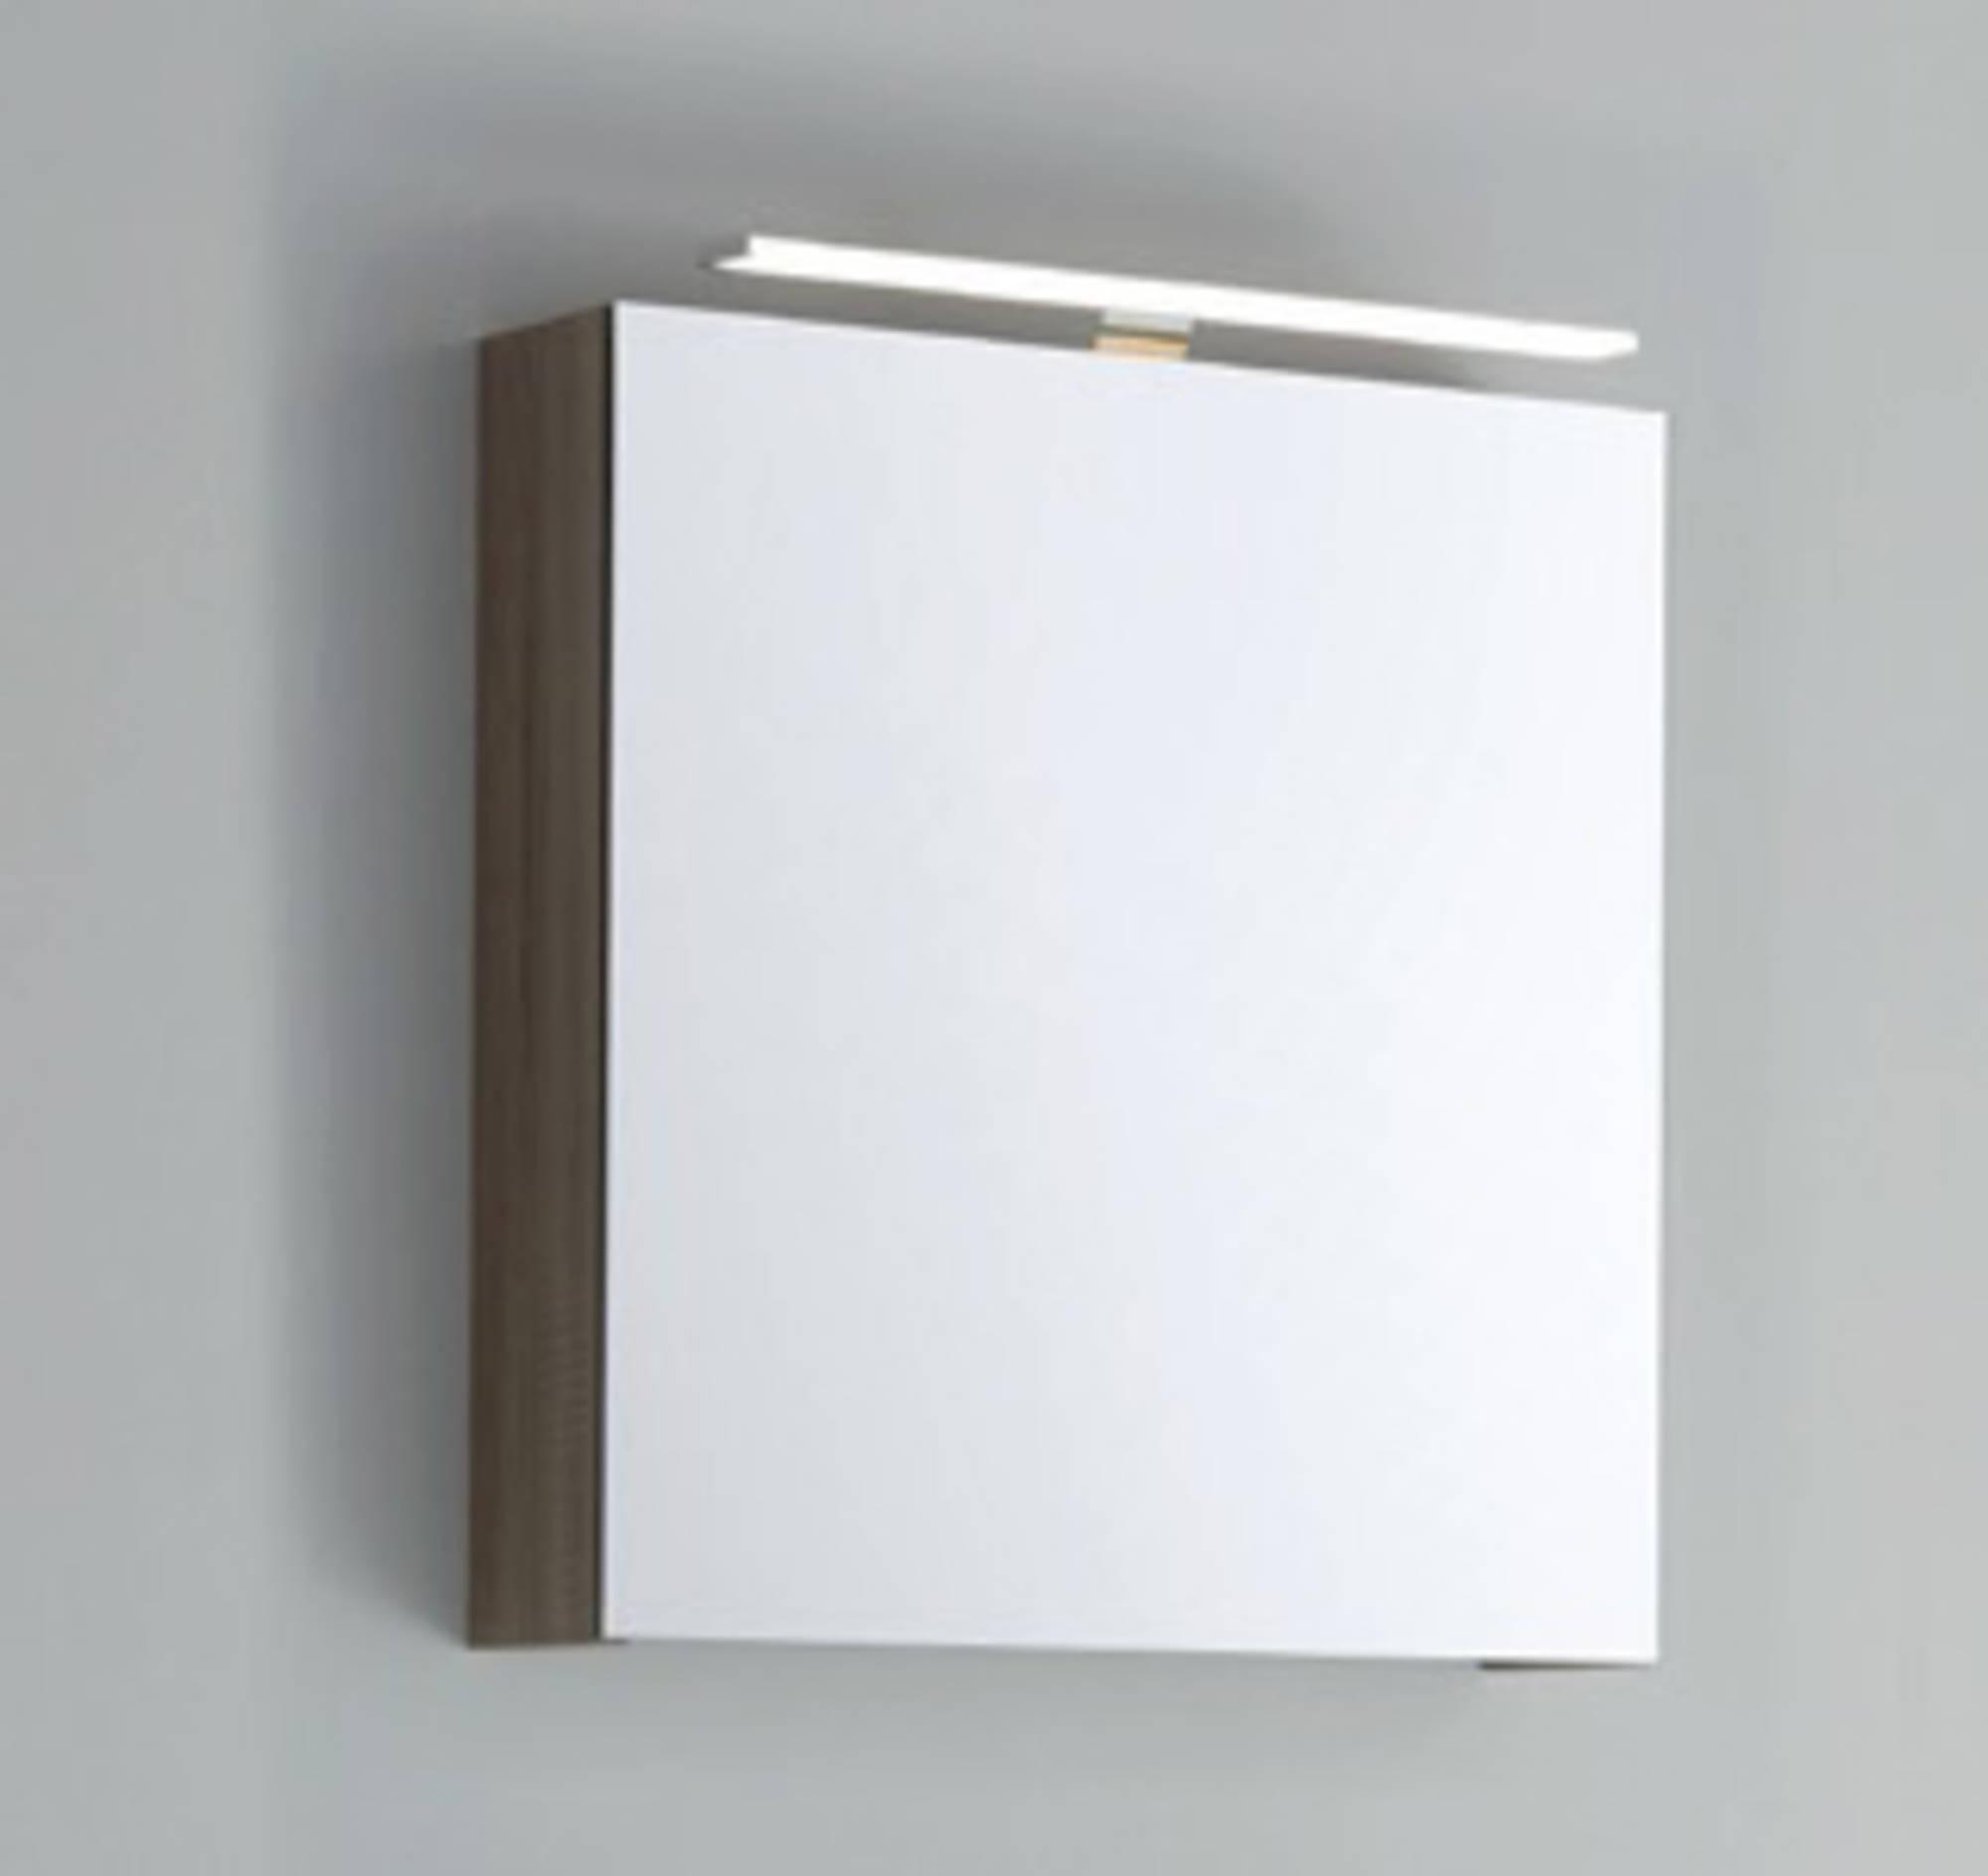 Line 45 Spiegelkast Linksdraaiend 60x13,5x60 cm excl. Verlichting Nebraska Eiken